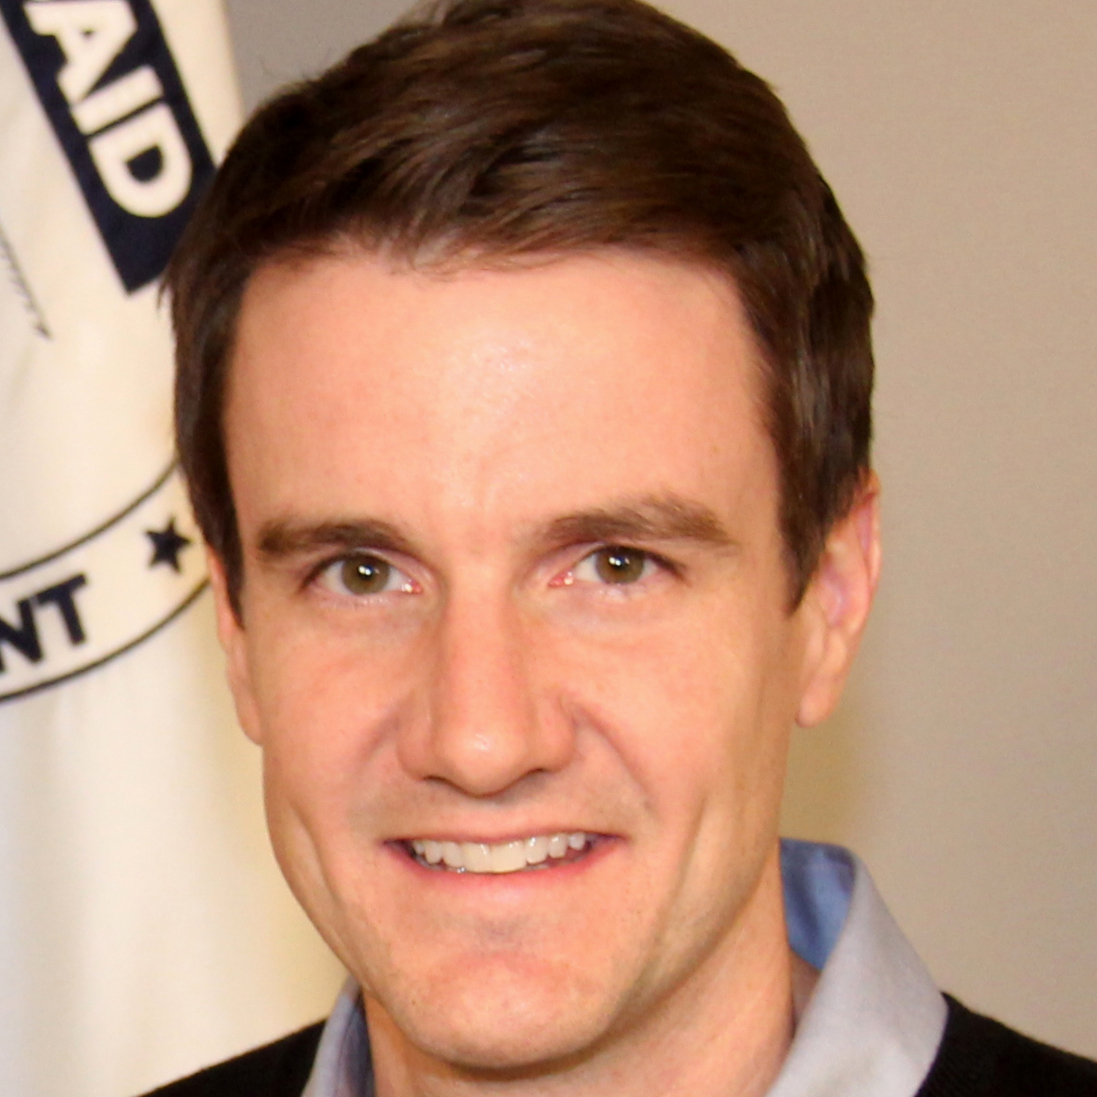 David_Milestone_USAID_SSIR_headshot